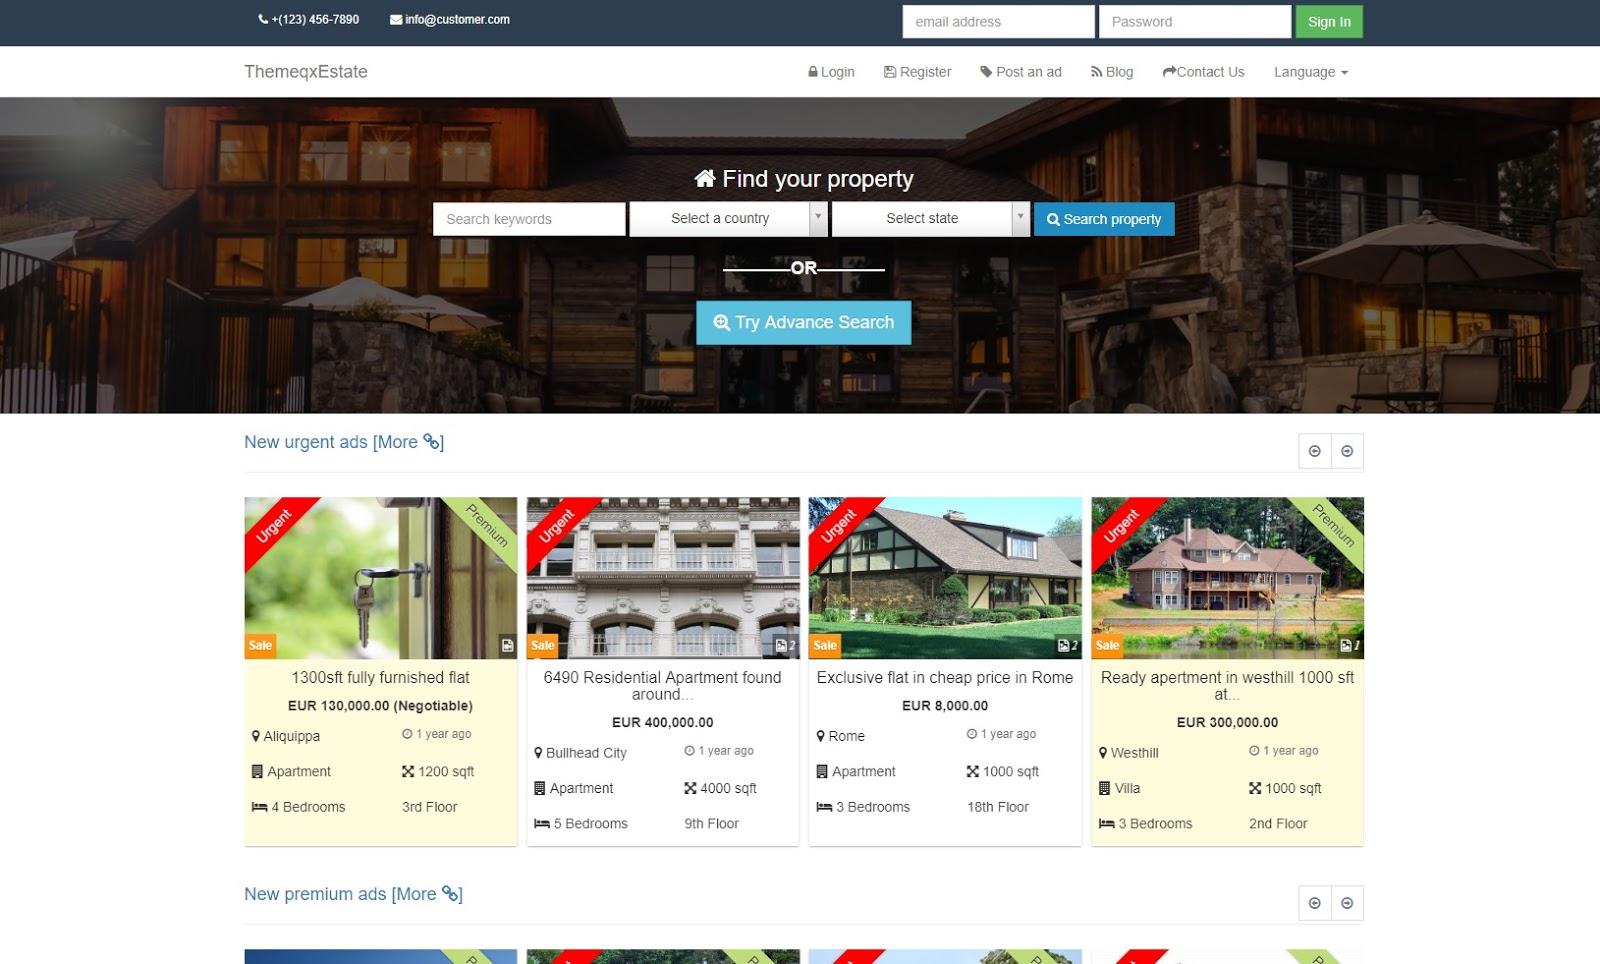 Share Source Code Website Bất Động Sản Đẹp ThemeqxEstate